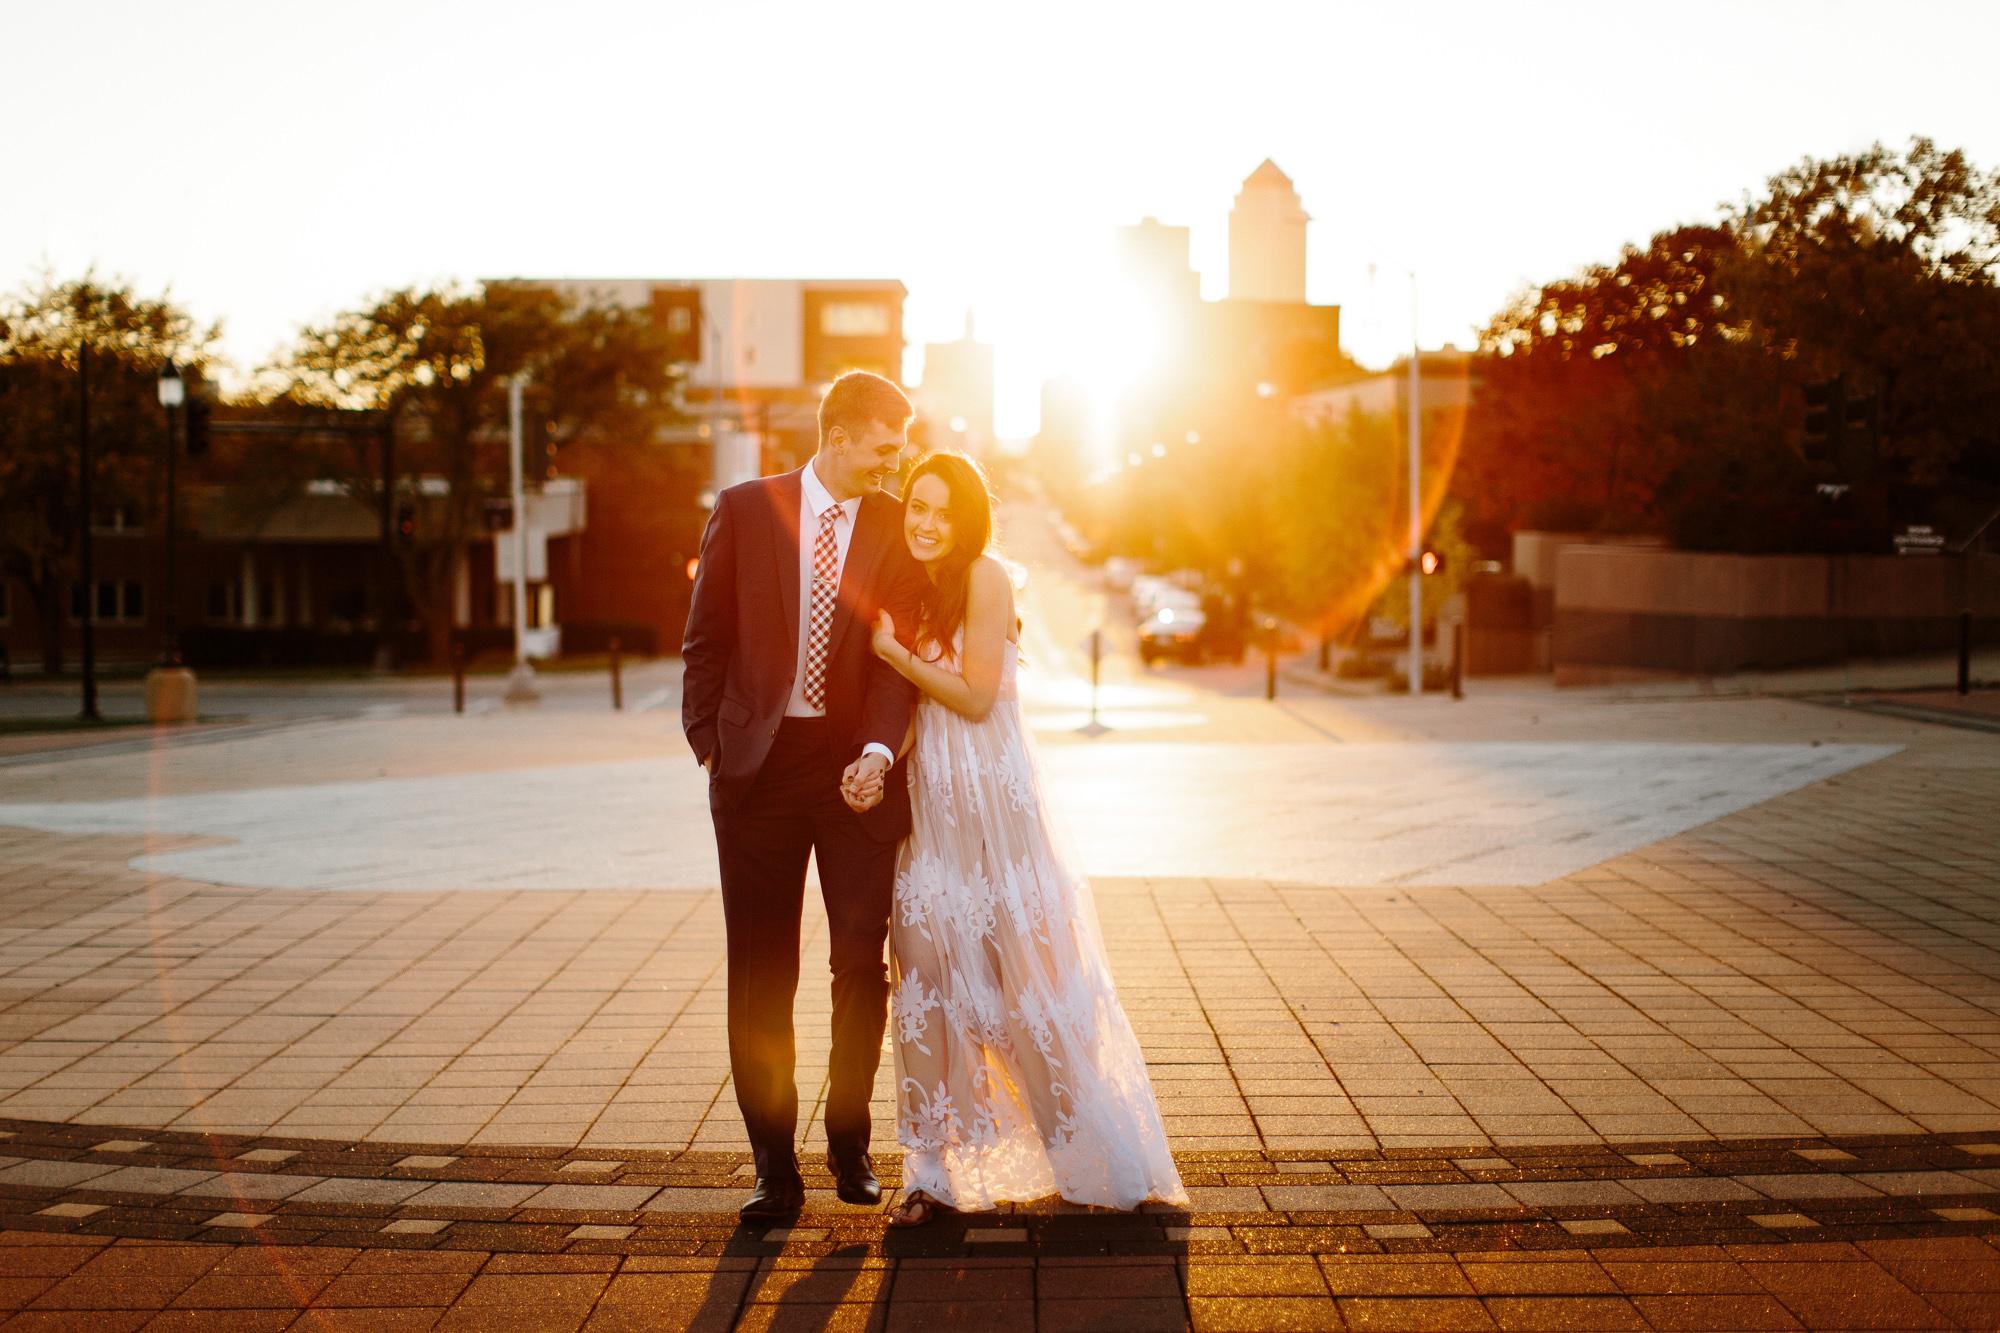 wedding-elopement-adventerous-romantic-timeless-des-moines-siouxfalls-photography-32.jpg